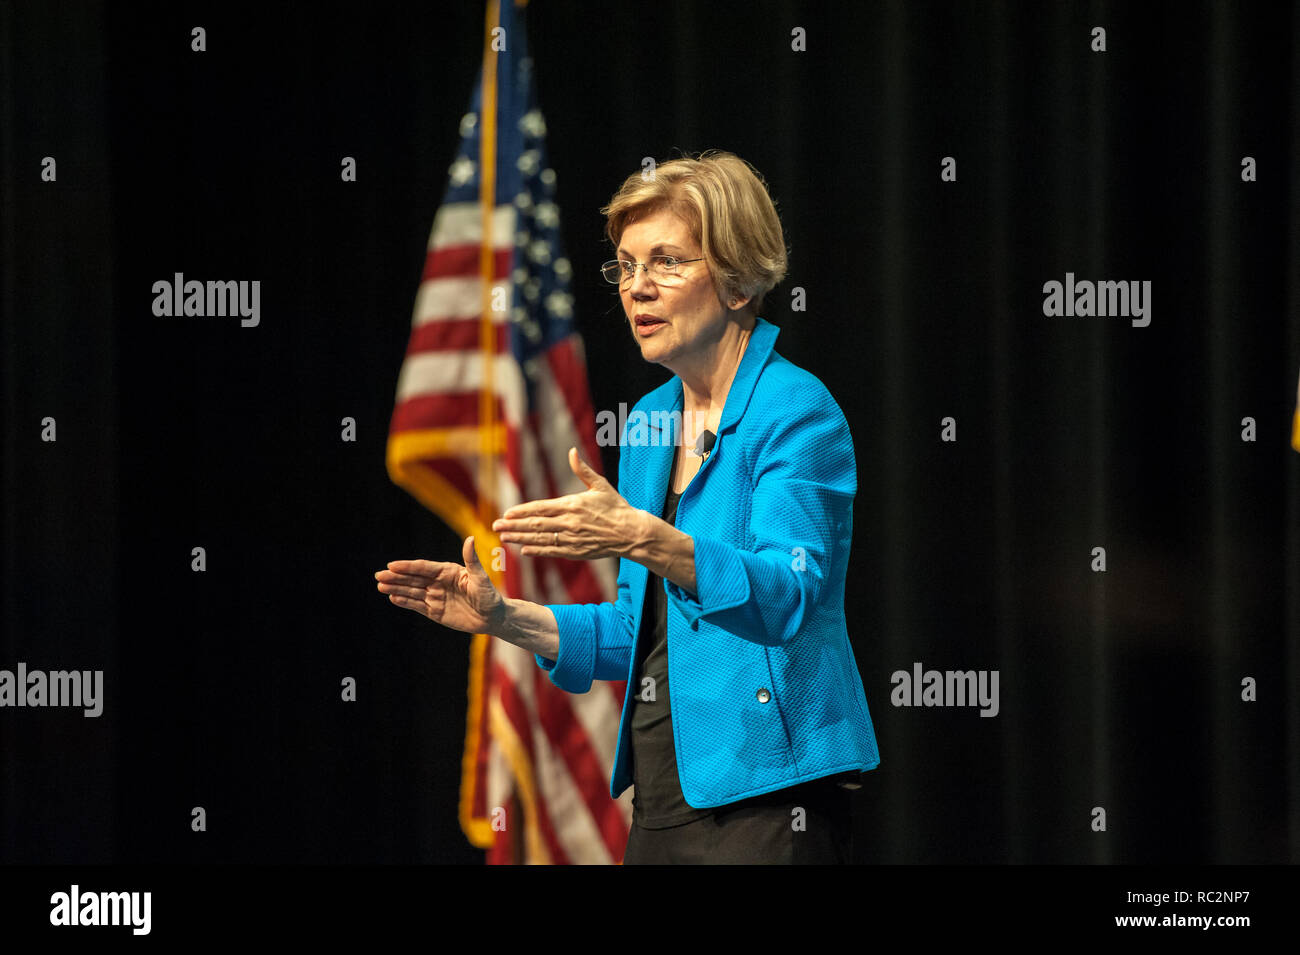 U.S. Senator Elizabeth Warren speaking on stage at her Town Hall at Concord-Carlisle Highschool in Massachusetts. - Stock Image